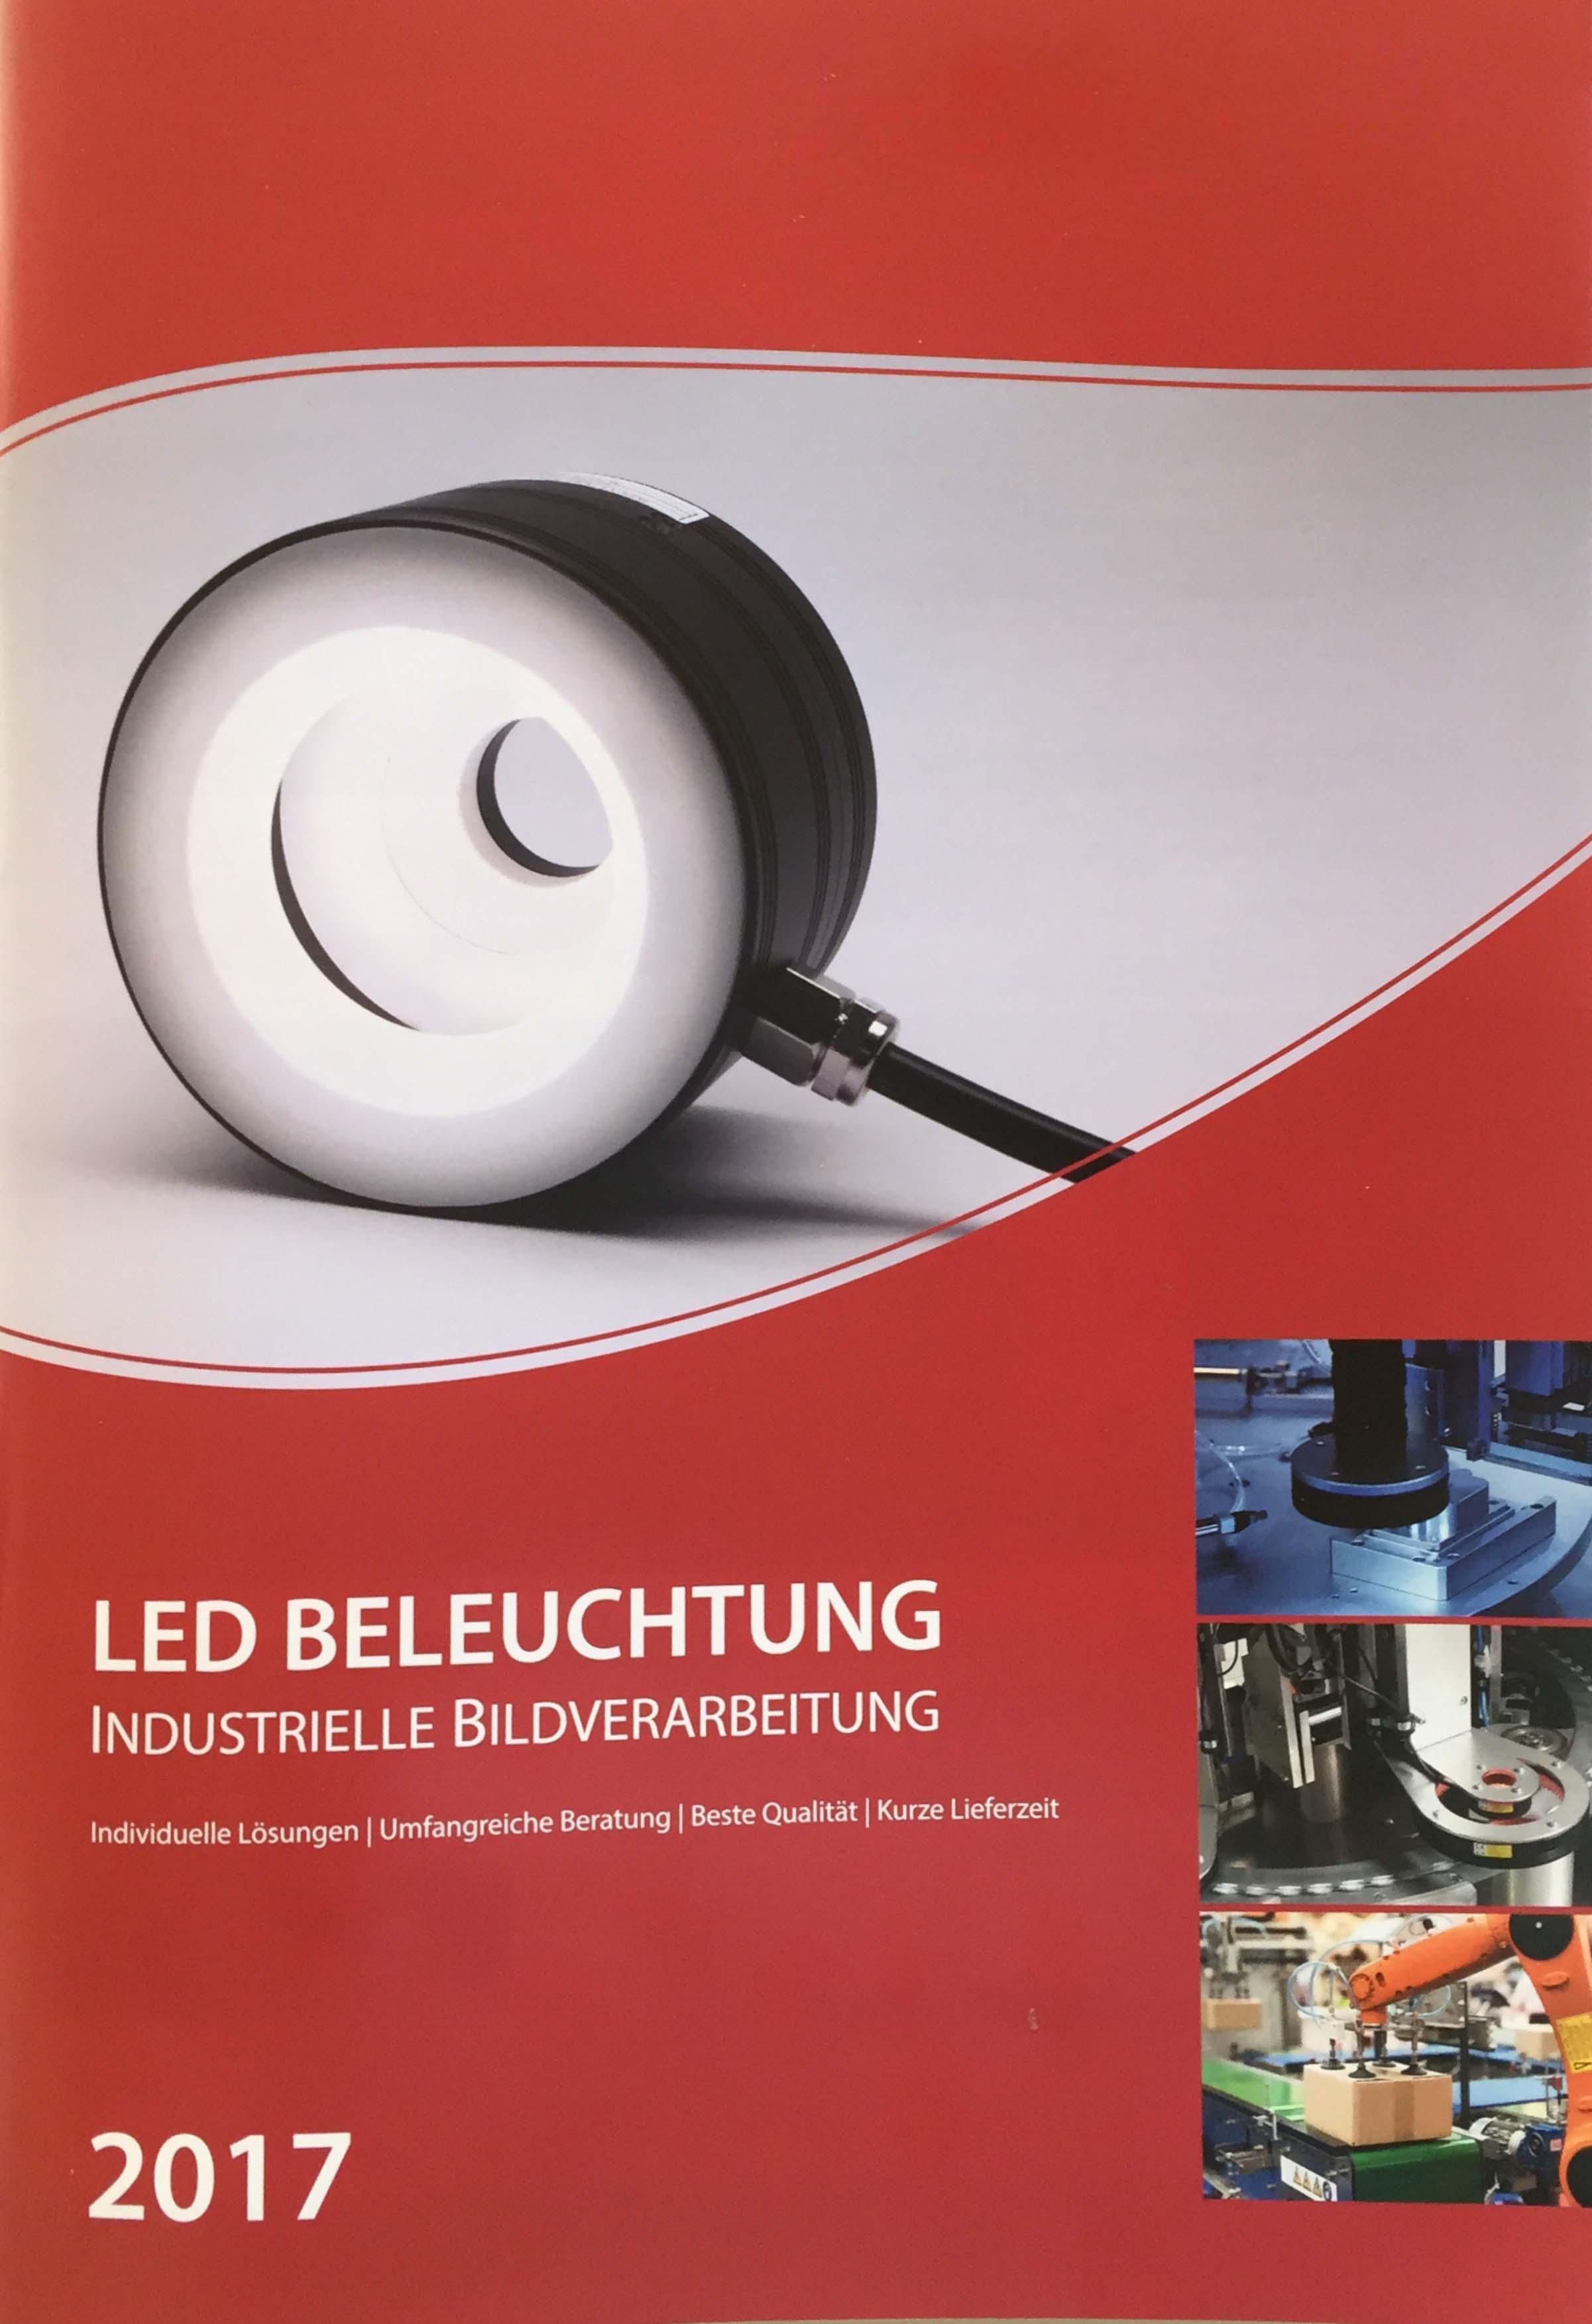 LED-Beleuchtungskatalog